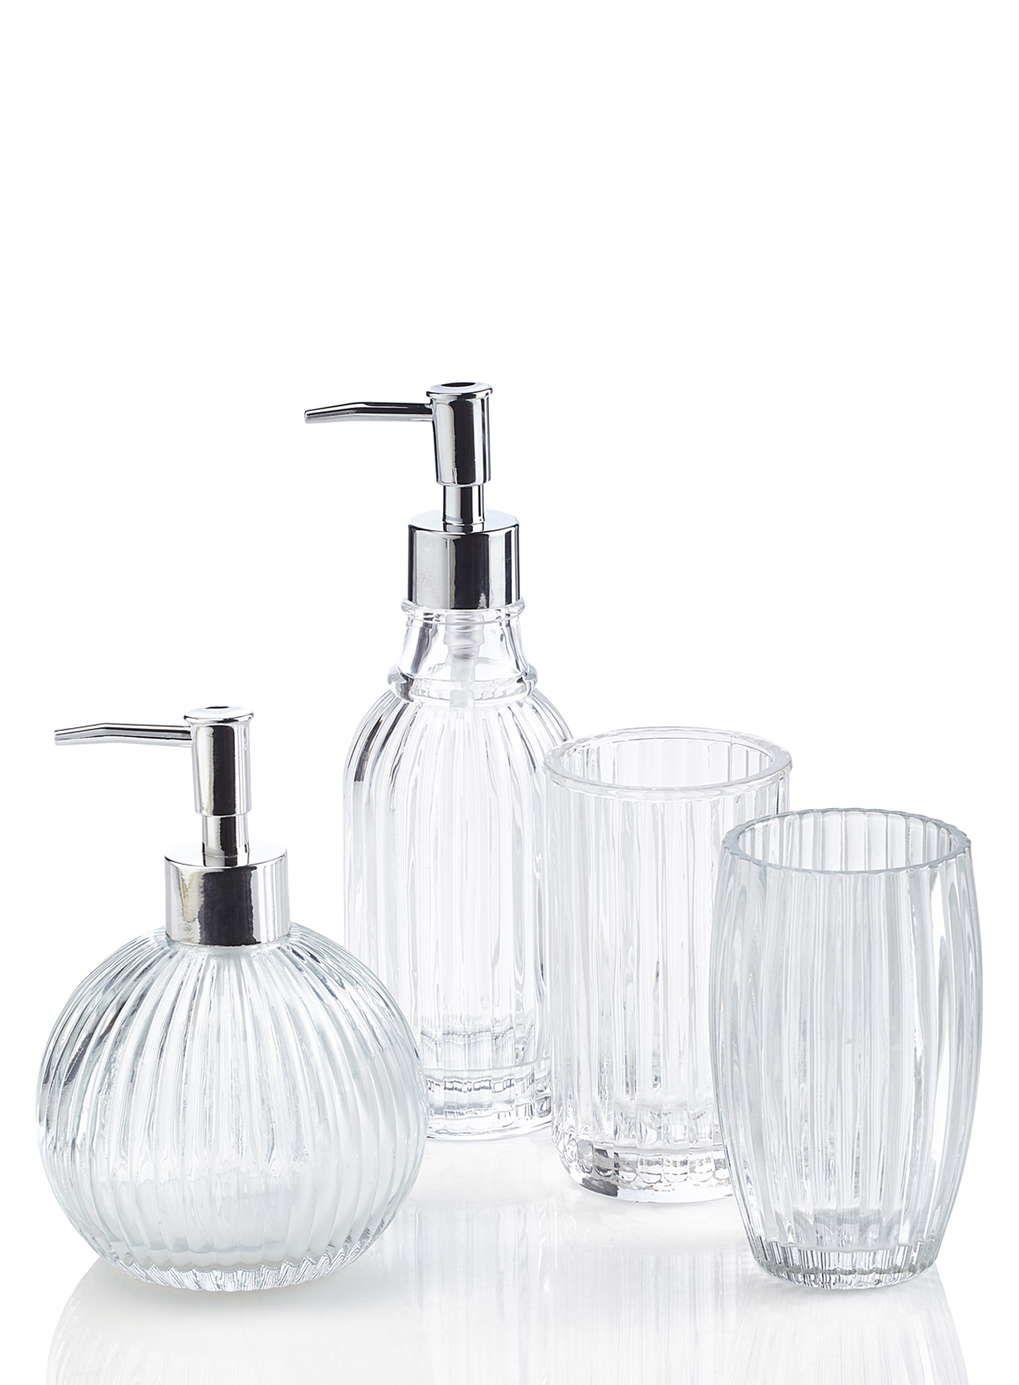 Holly Willoughby Bathroom Accessories - BHS | Bathroom | Pinterest ...